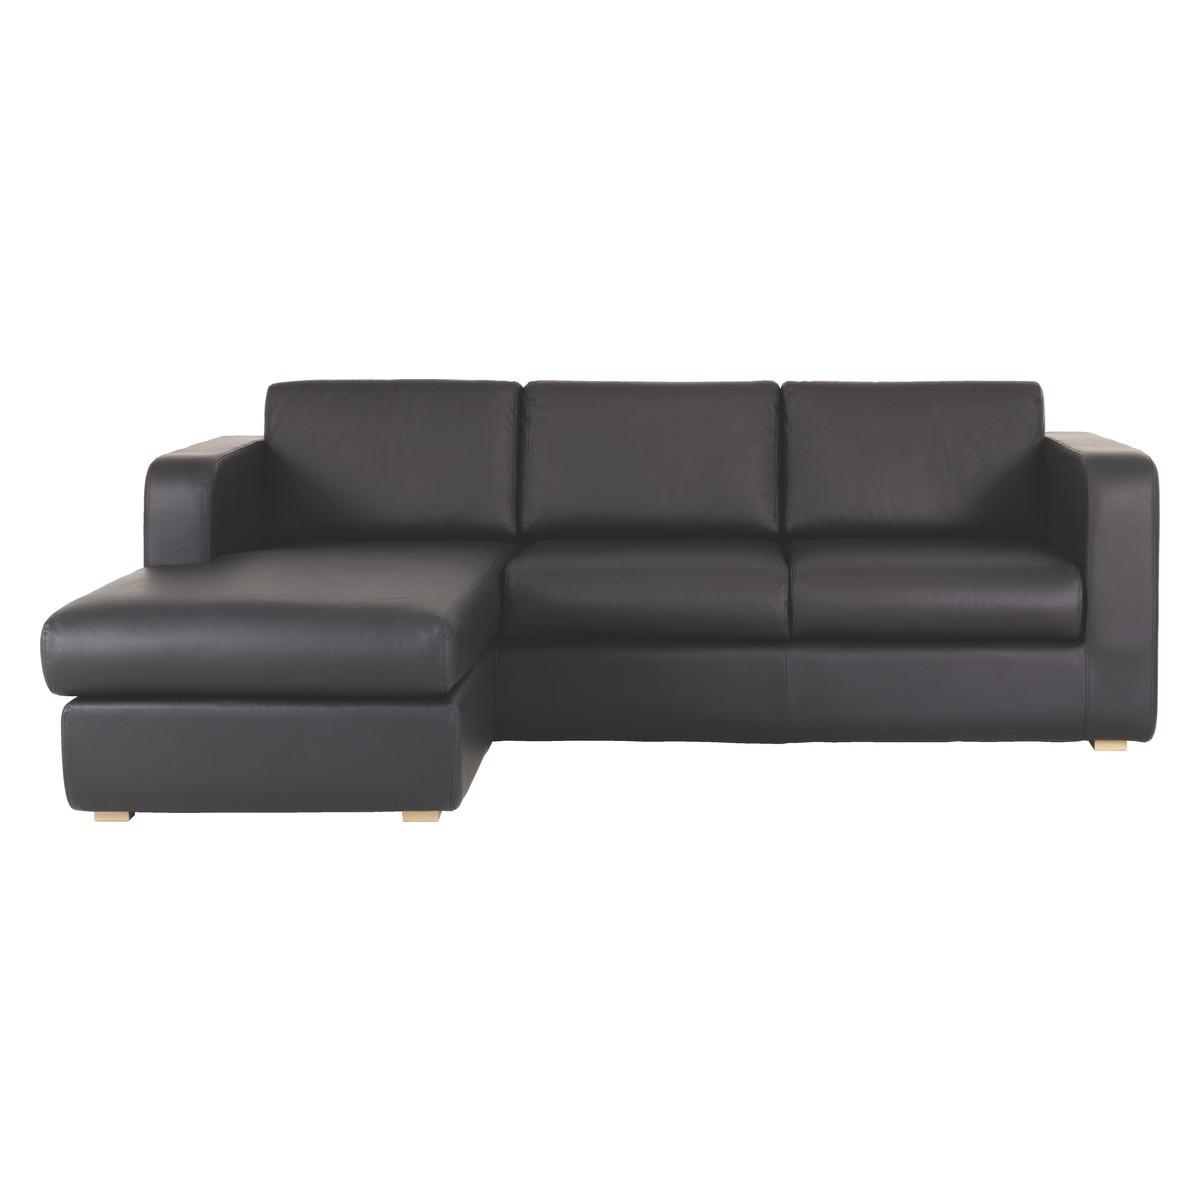 Corner Sofa Sale London: 20 Best Corner Sofa Bed Sale